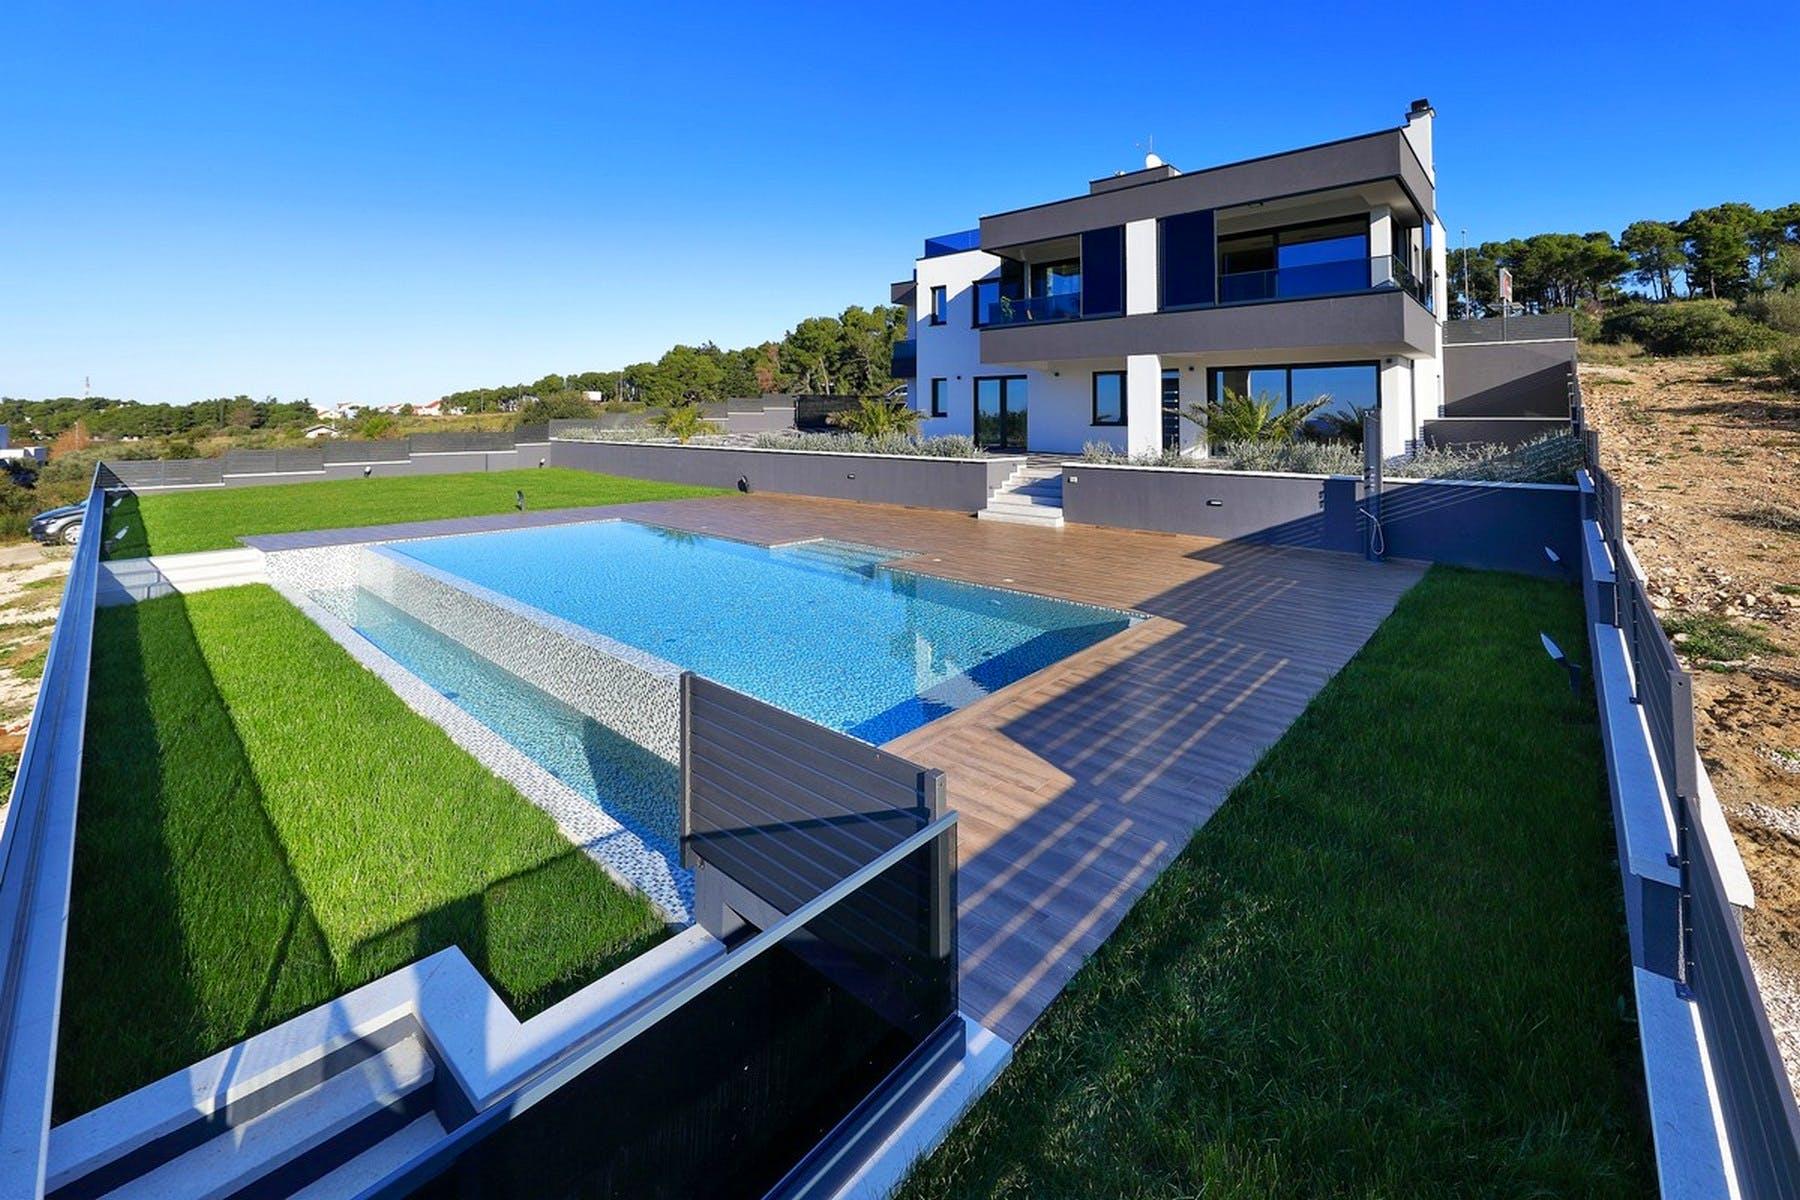 Greenary surrounding the pool